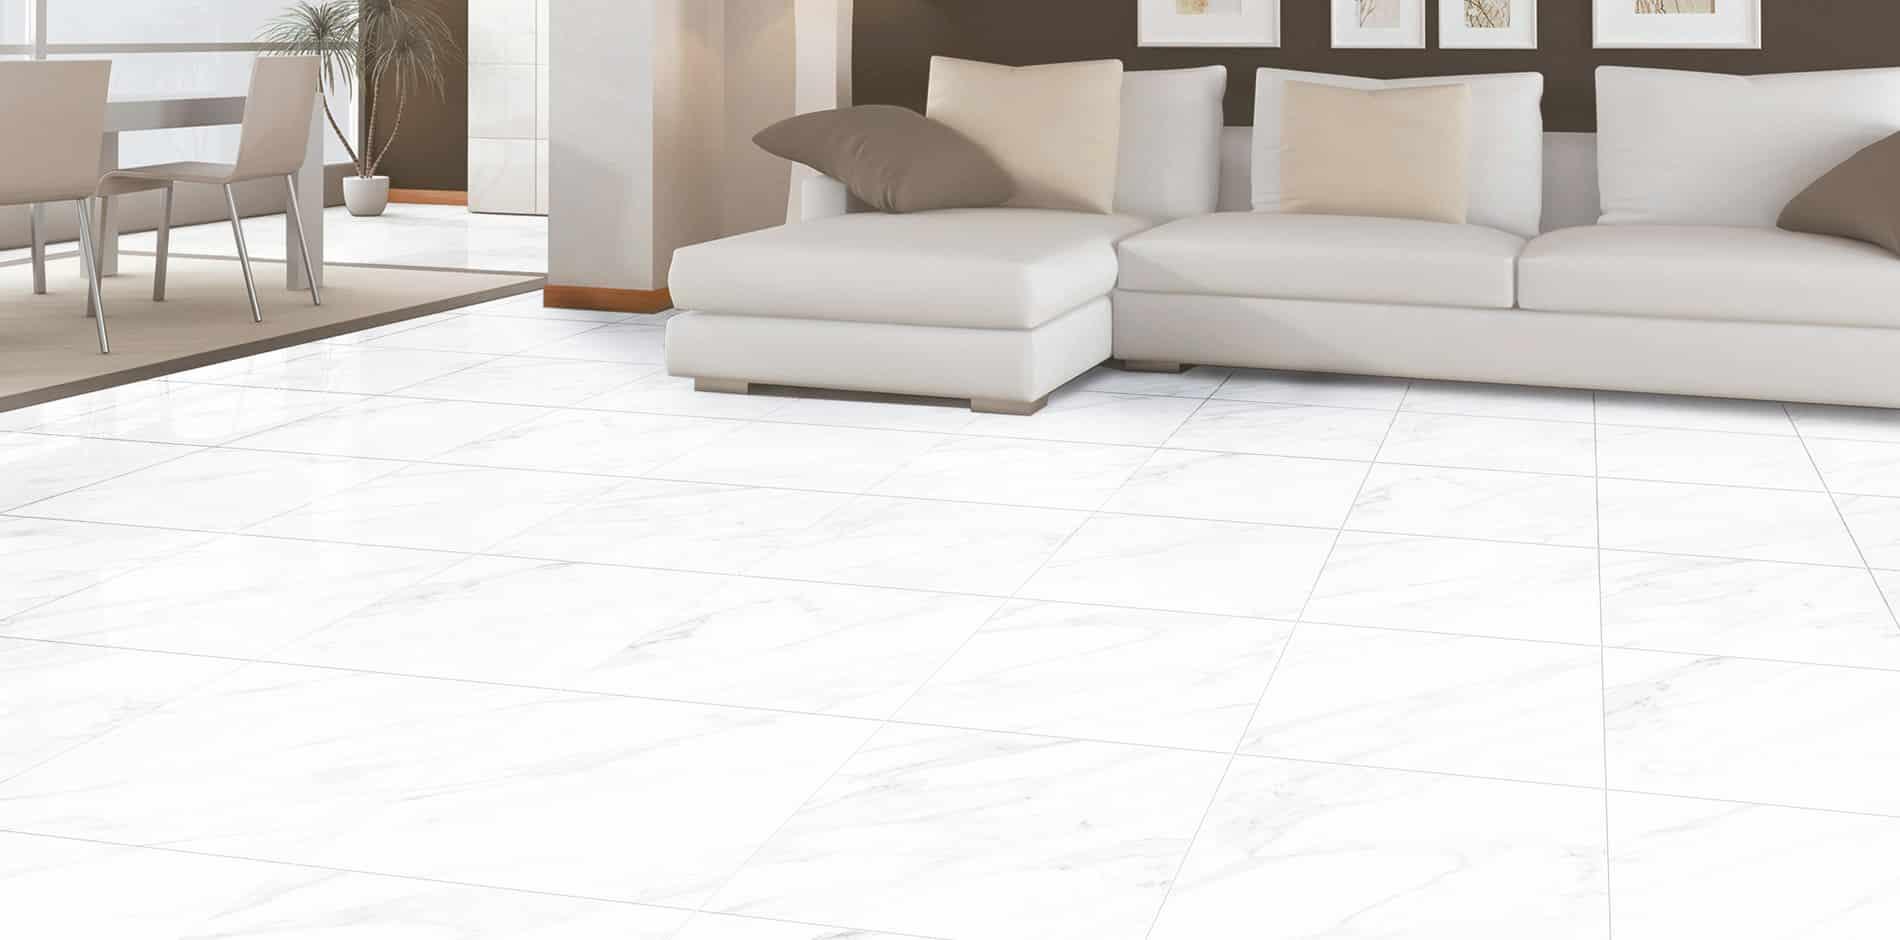 Floor shine for tiles image collections home flooring design best floor shine for tiles pictures flooring area rugs home palladio carrara shine internal tiles 450 dailygadgetfo Image collections